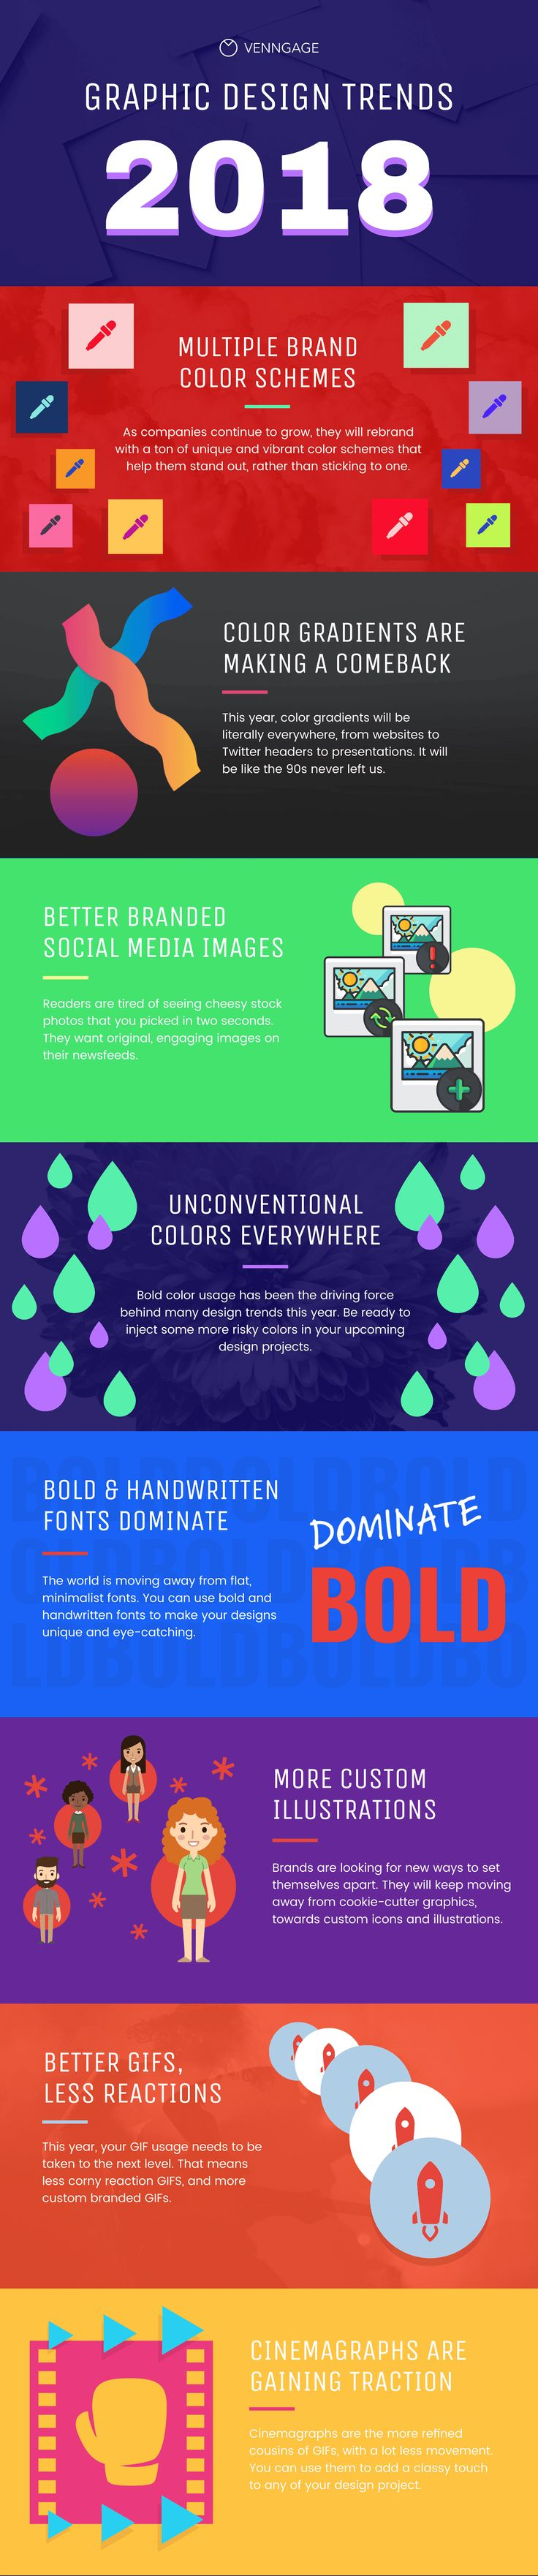 Graphic Design Trends 2018 - #infographic